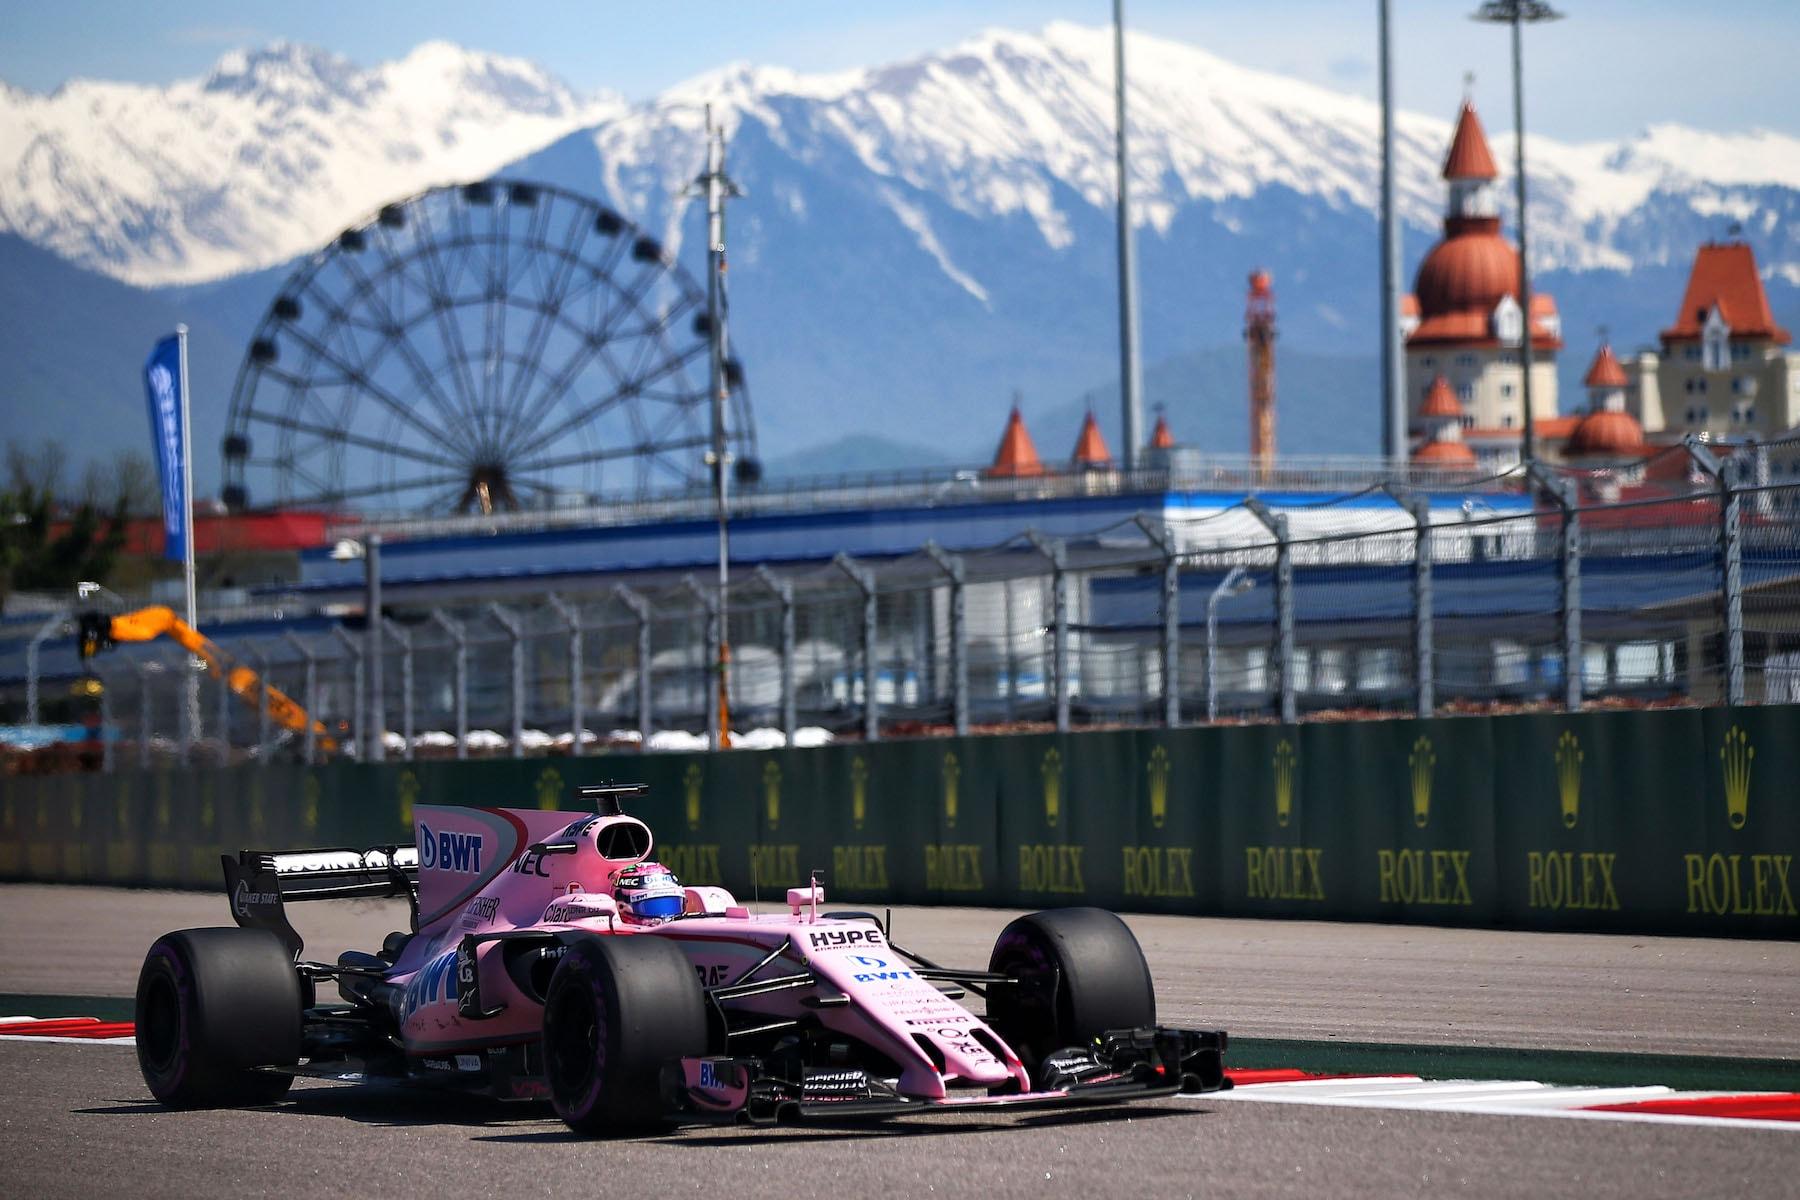 2017 Sergio Perez | Force India VJM10 | 2017 Russian GP Q1 1 copy.jpg